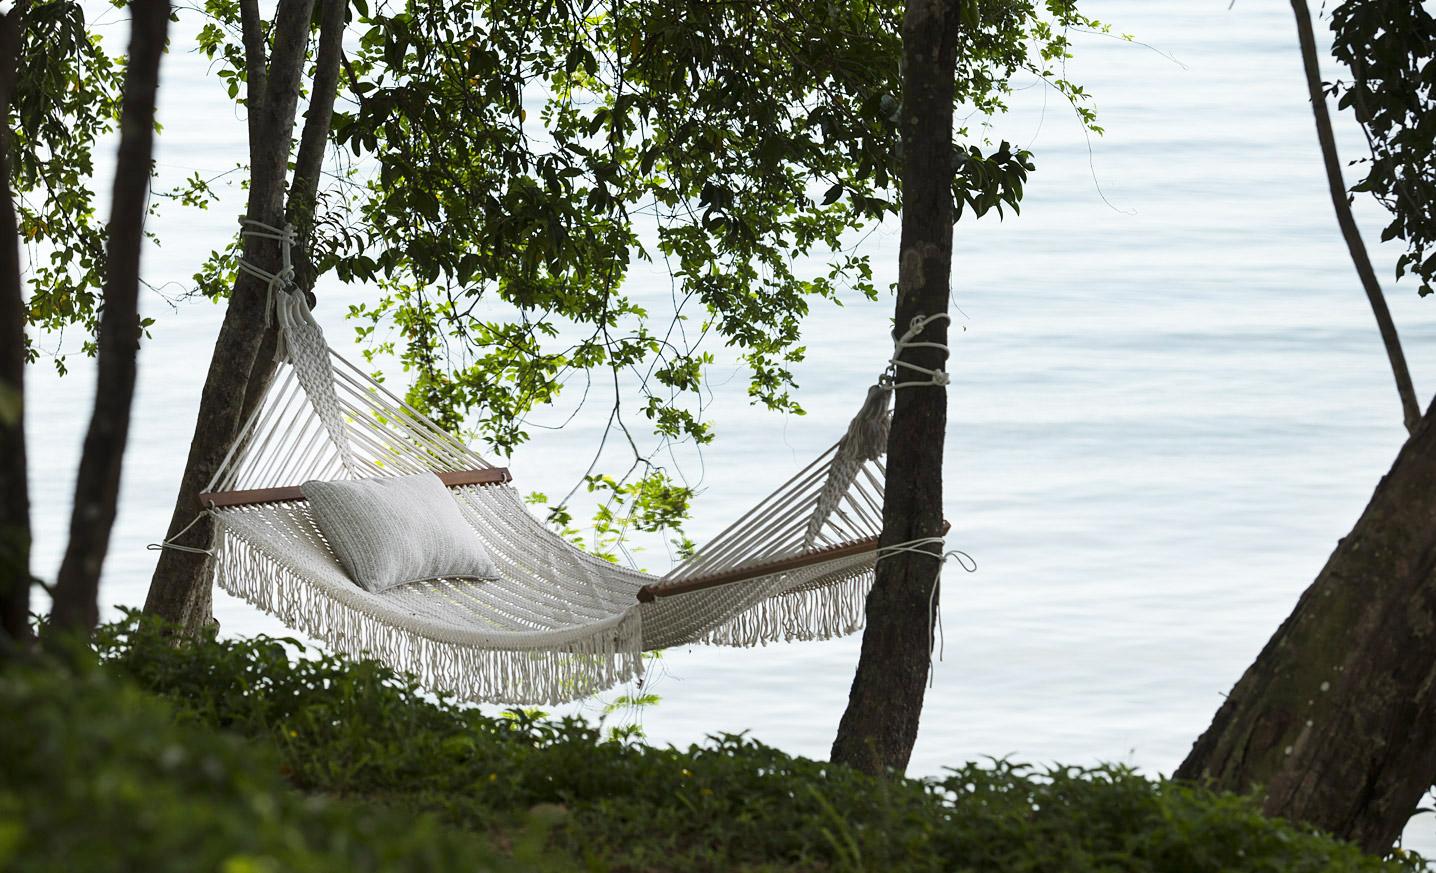 The best Hotel in Krabi for Honeymoon & exotic Weddings by the sea!